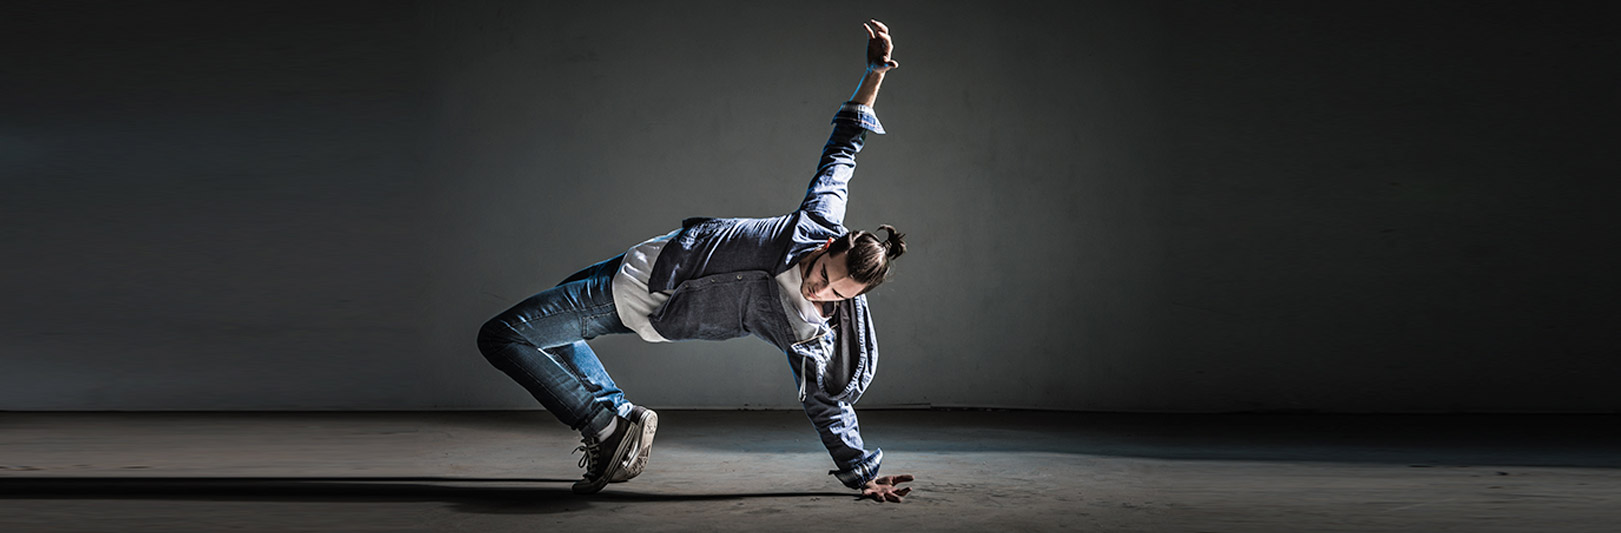 streetdance tanzschule kurse muenchen 01 - Streetdance